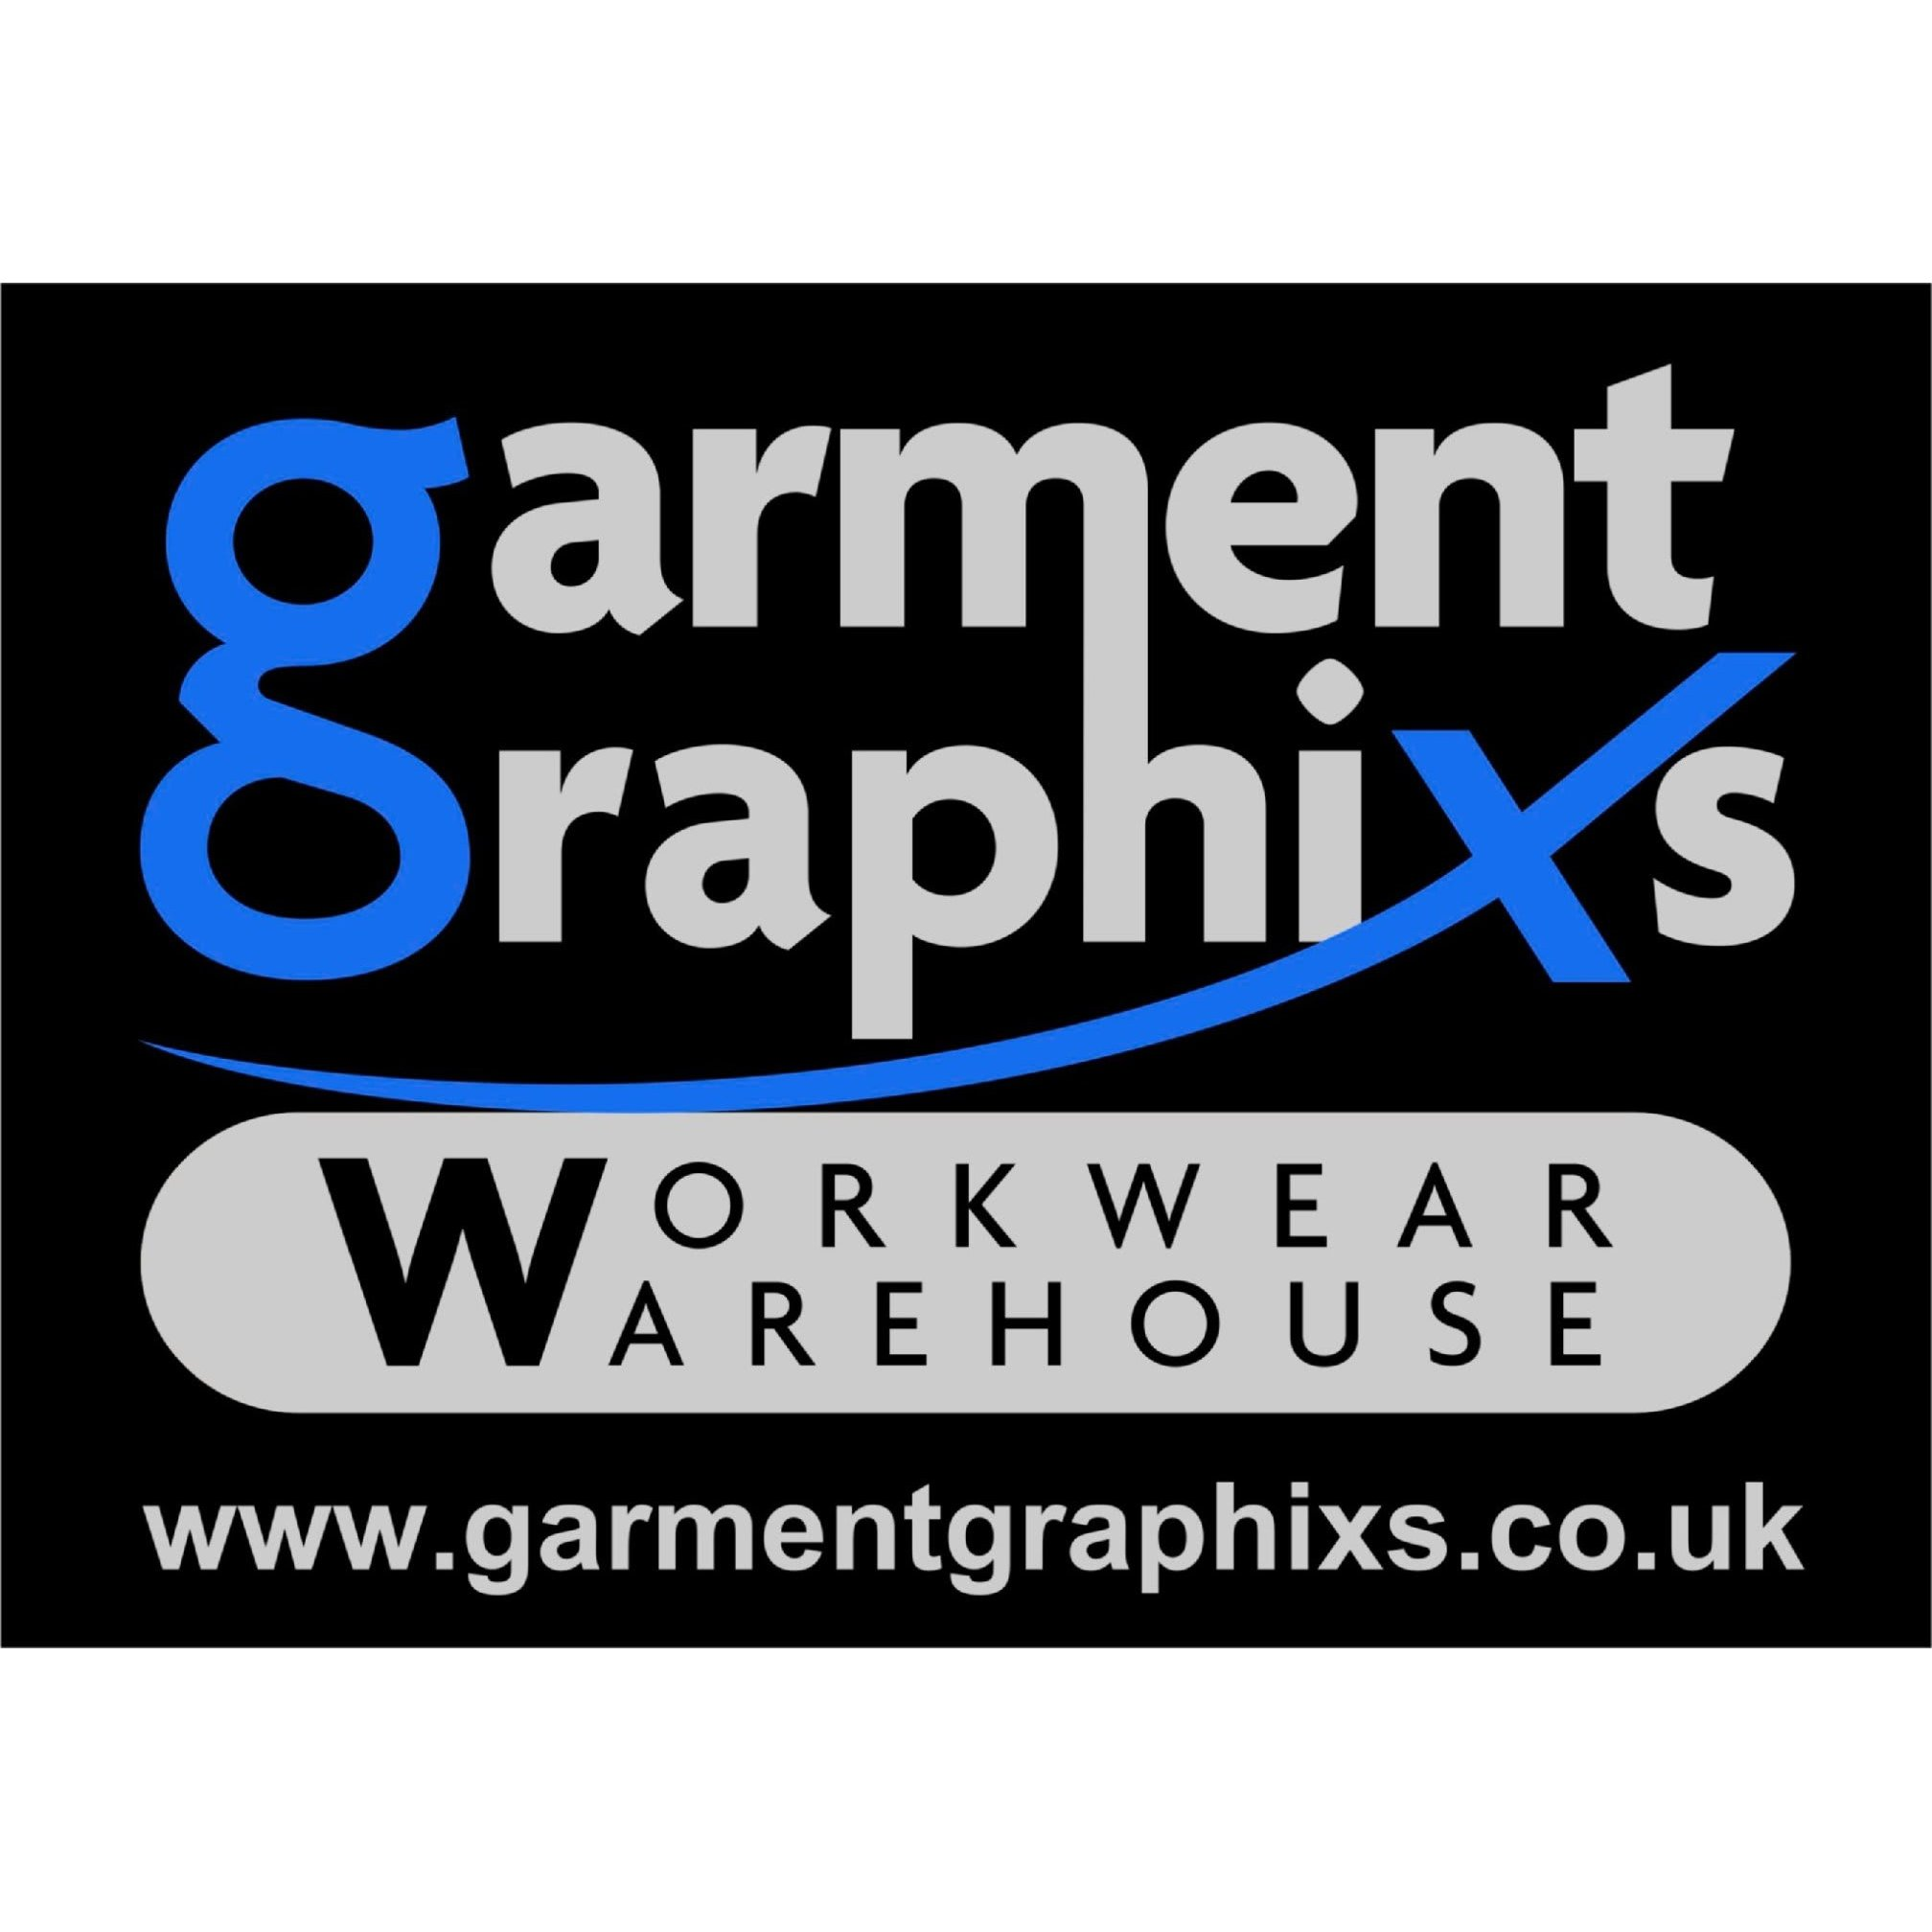 Garment Graphixs & the Workwear Warehouse - Belfast, County Antrim BT3 9BW - 02890 777114 | ShowMeLocal.com